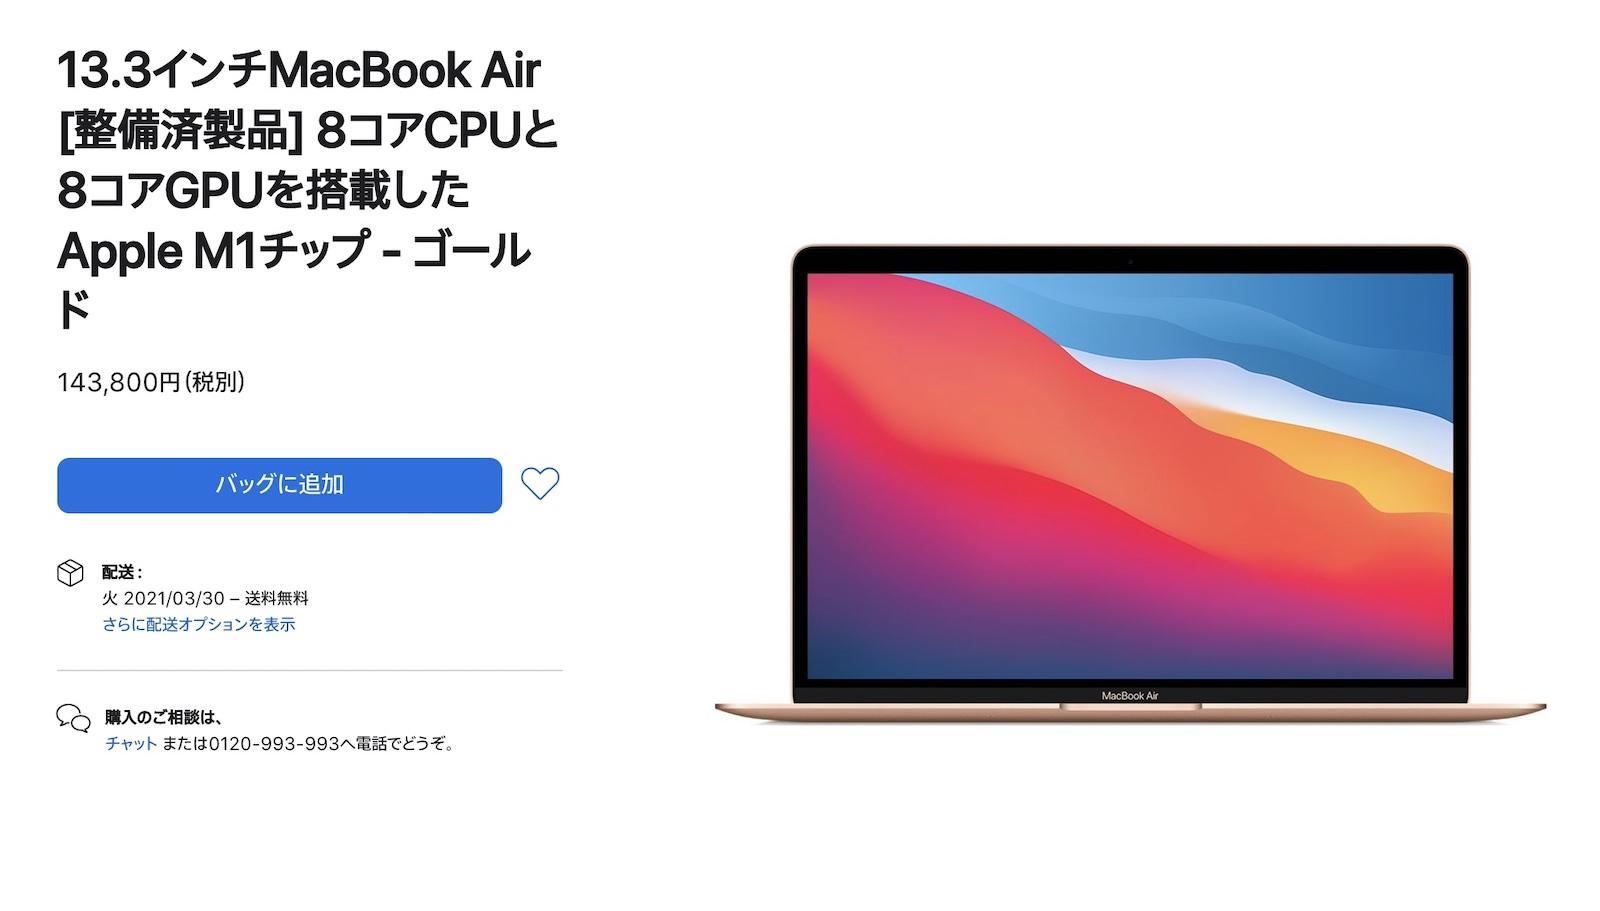 MacBook Airが安く購入できる